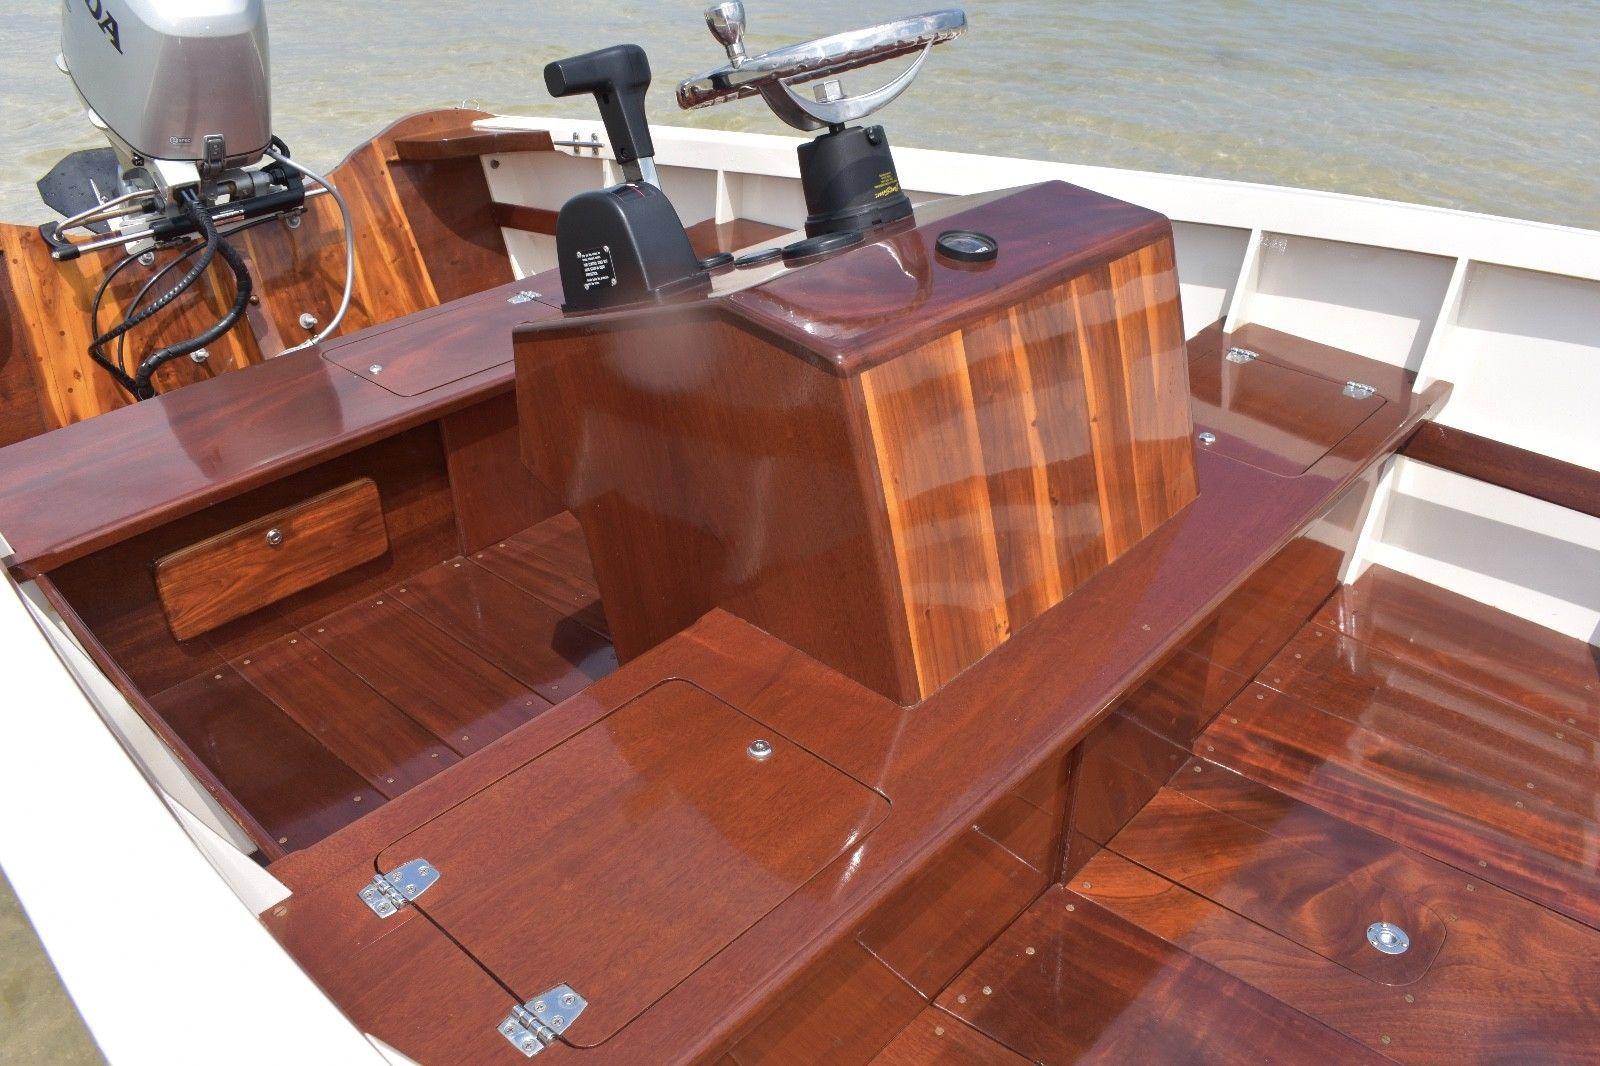 World famous 16ft bimini bonefisher skiff by ansil saunders   Boats